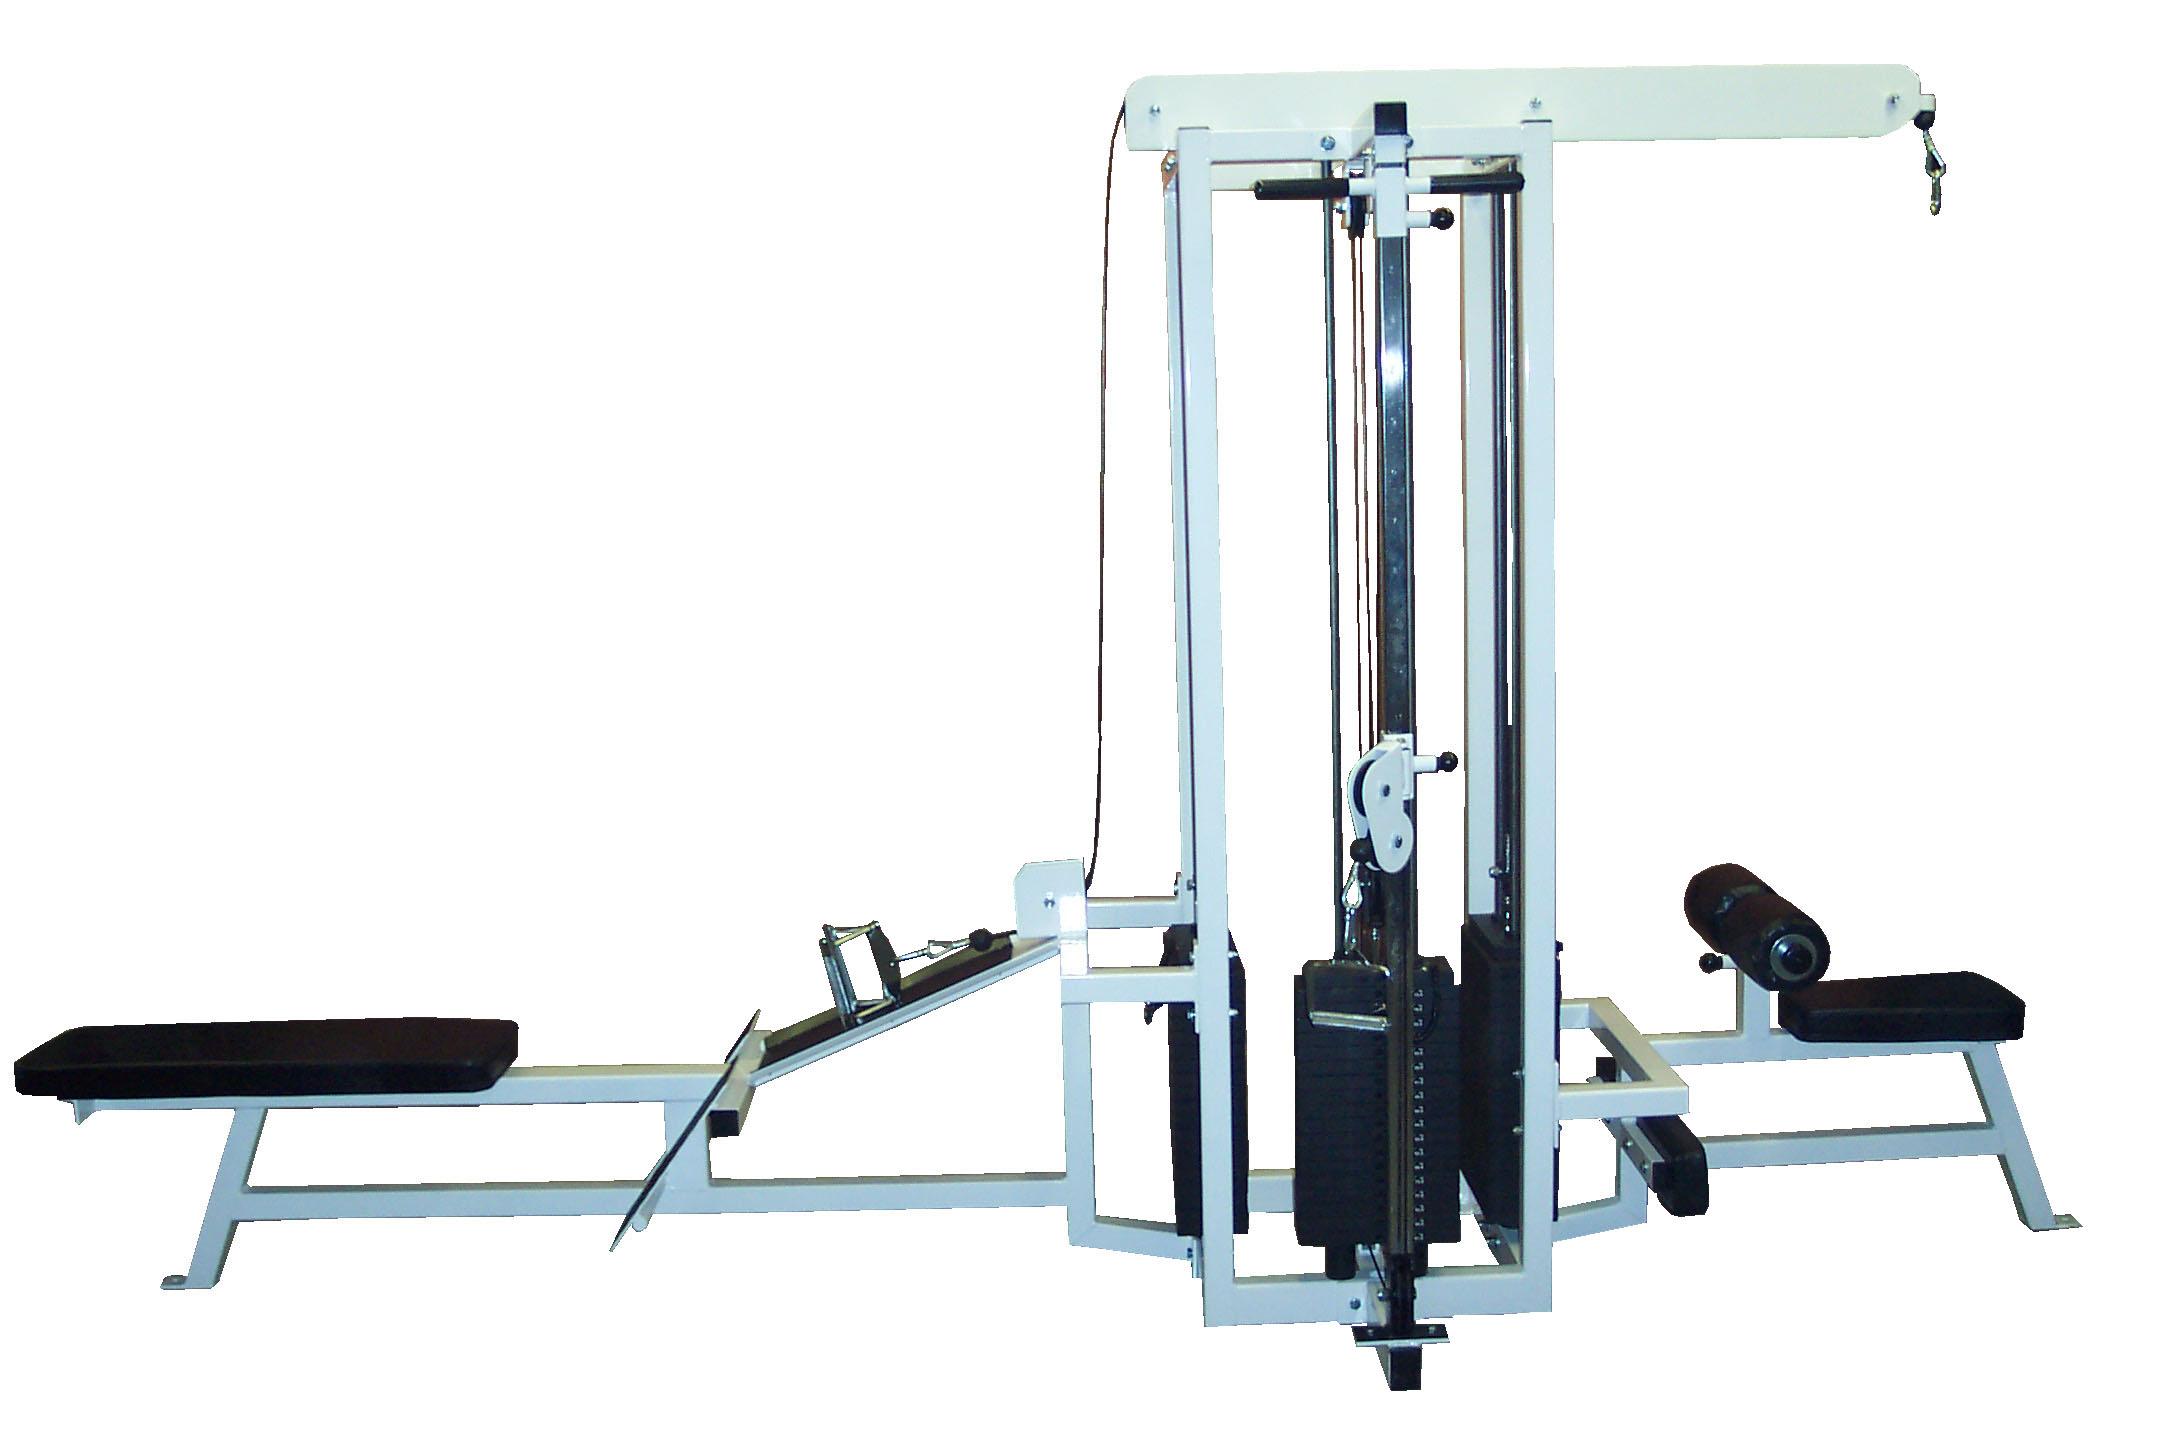 MAX#HG1 3-Station Gym (3 Stacks)